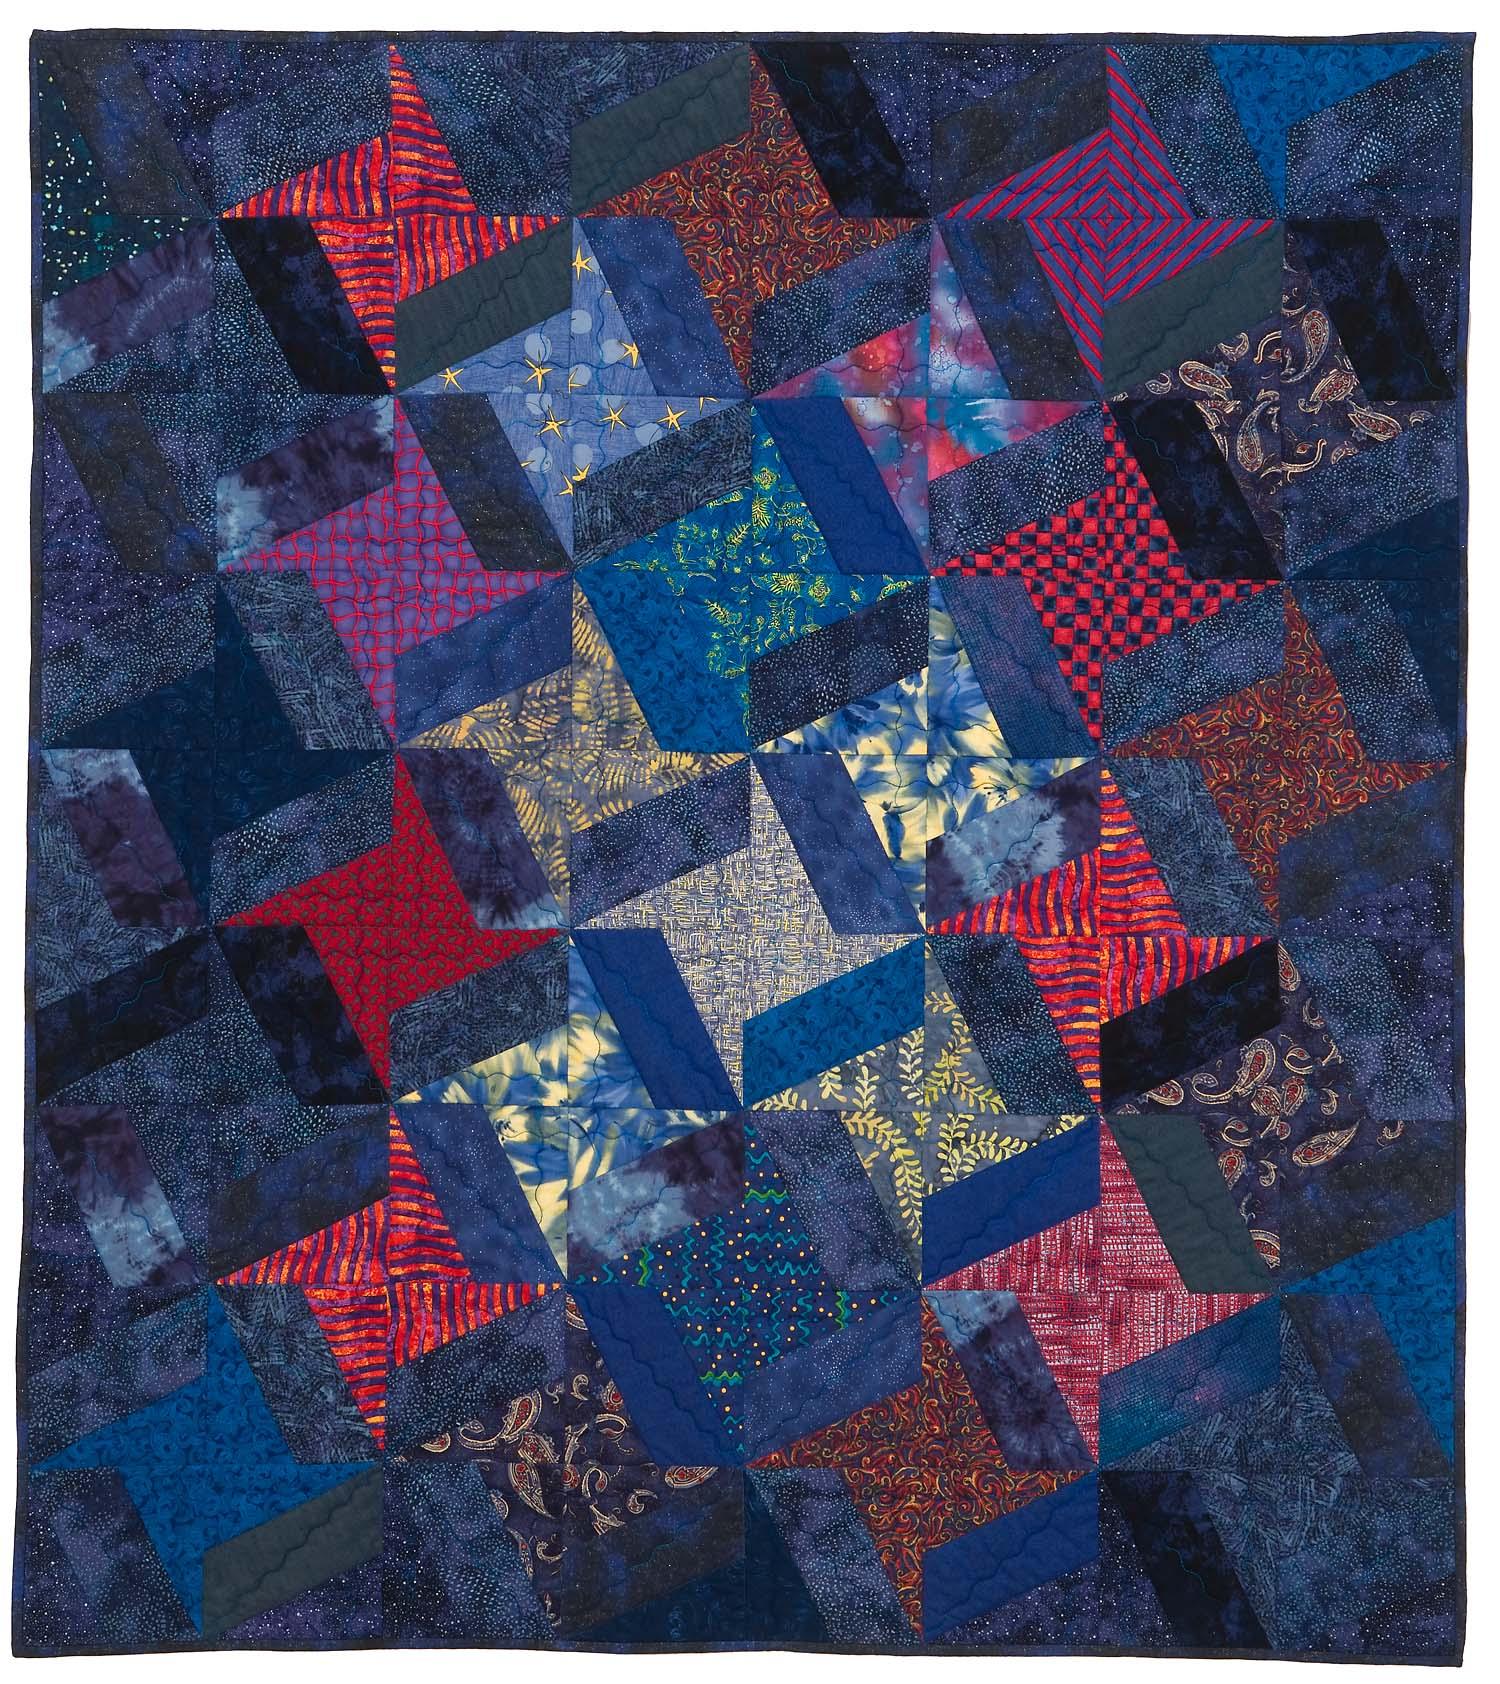 "Starry Night, 47"" wide x 52.5"" high, 2002"